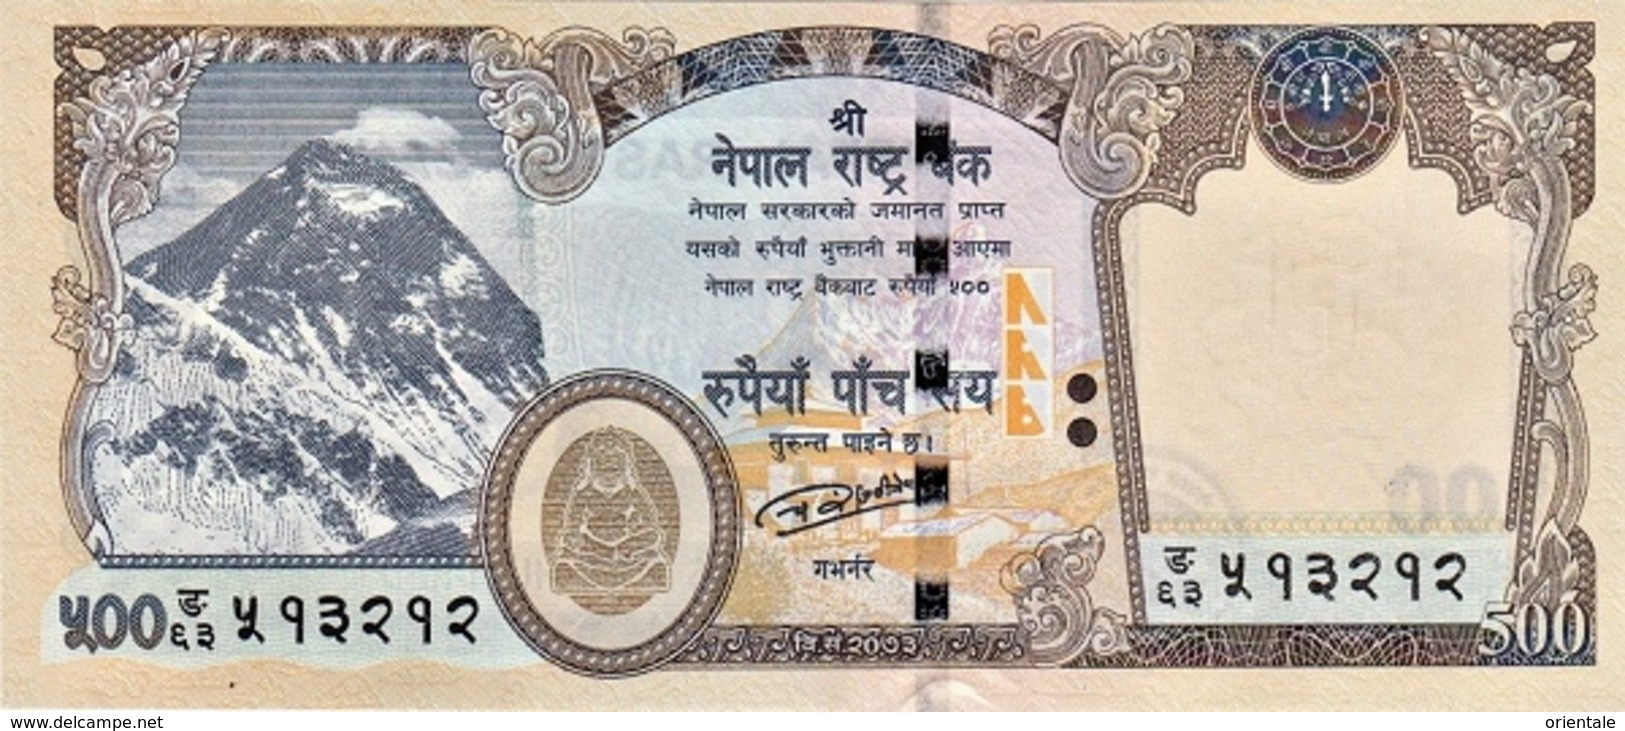 NEPAL P. NEW 500 R 2016 UNC - Nepal